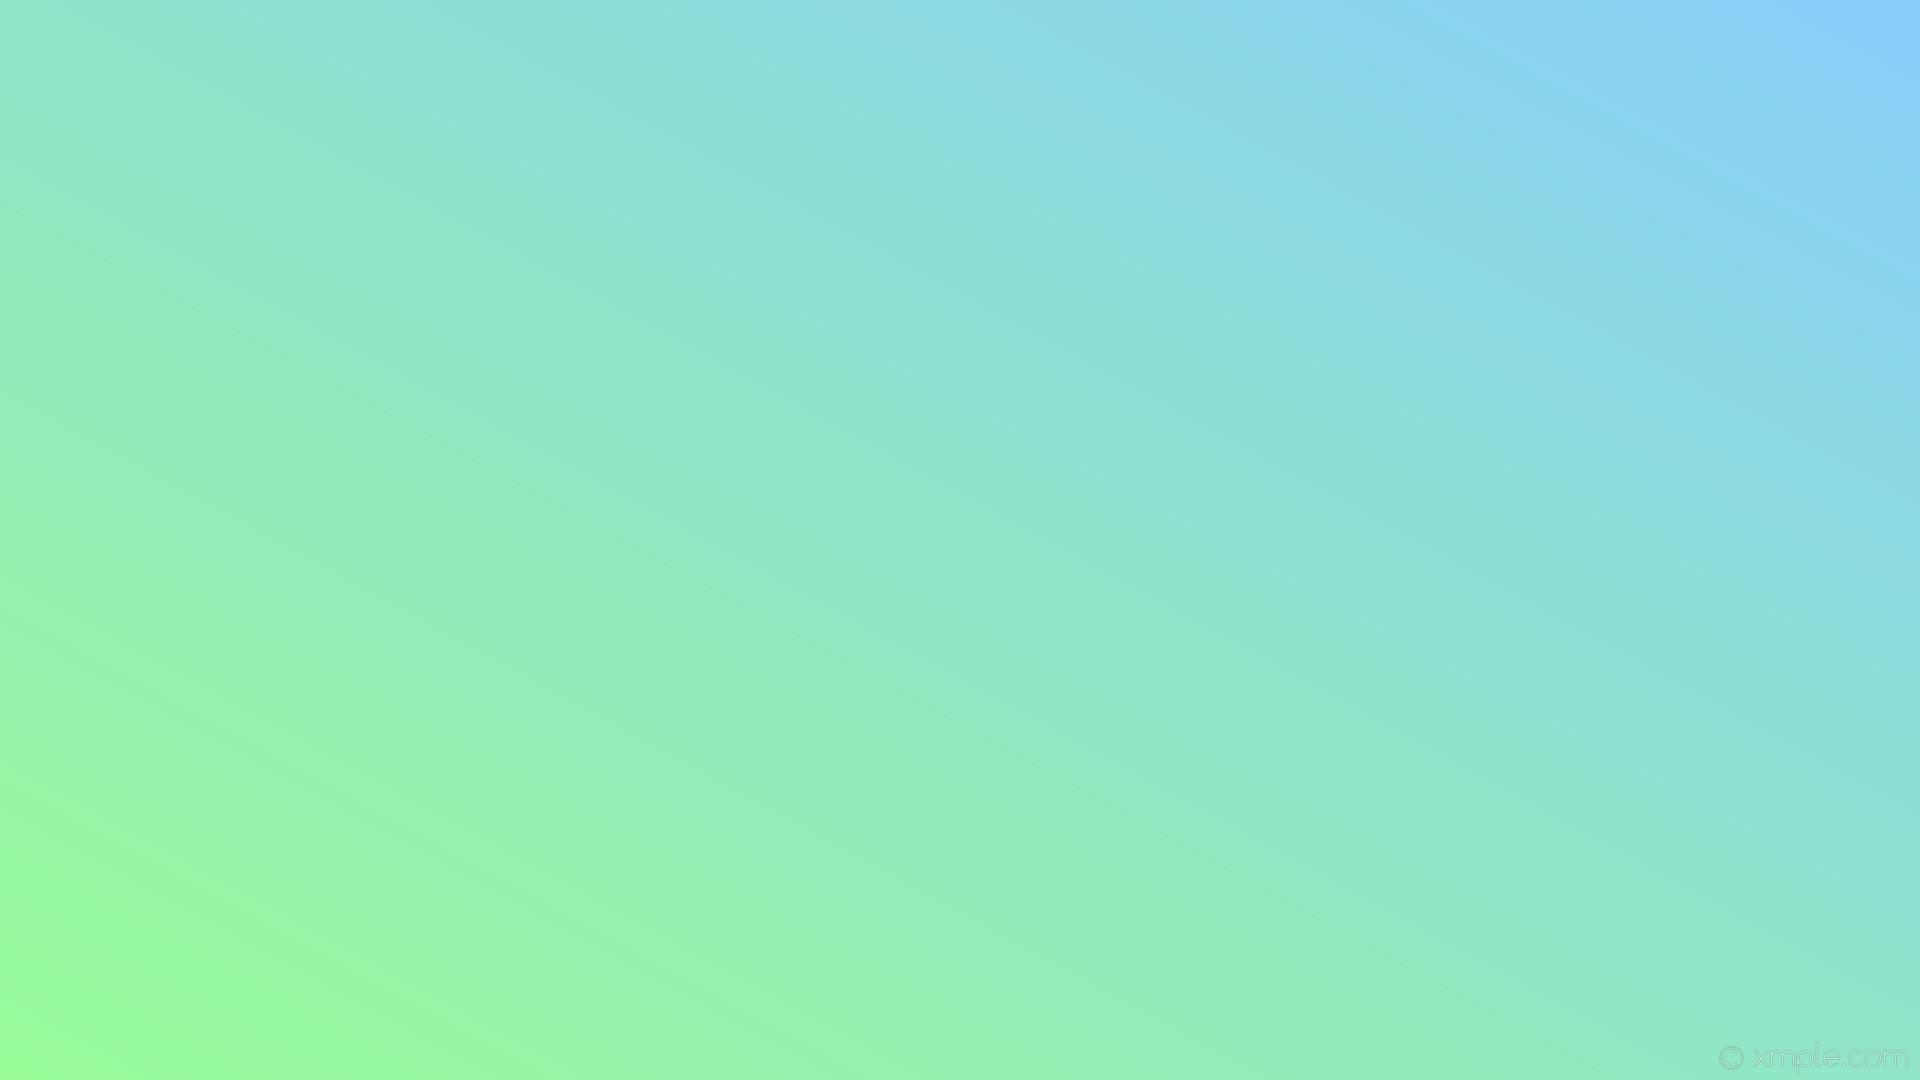 Light Blue Green Wallpaper (72+ Images